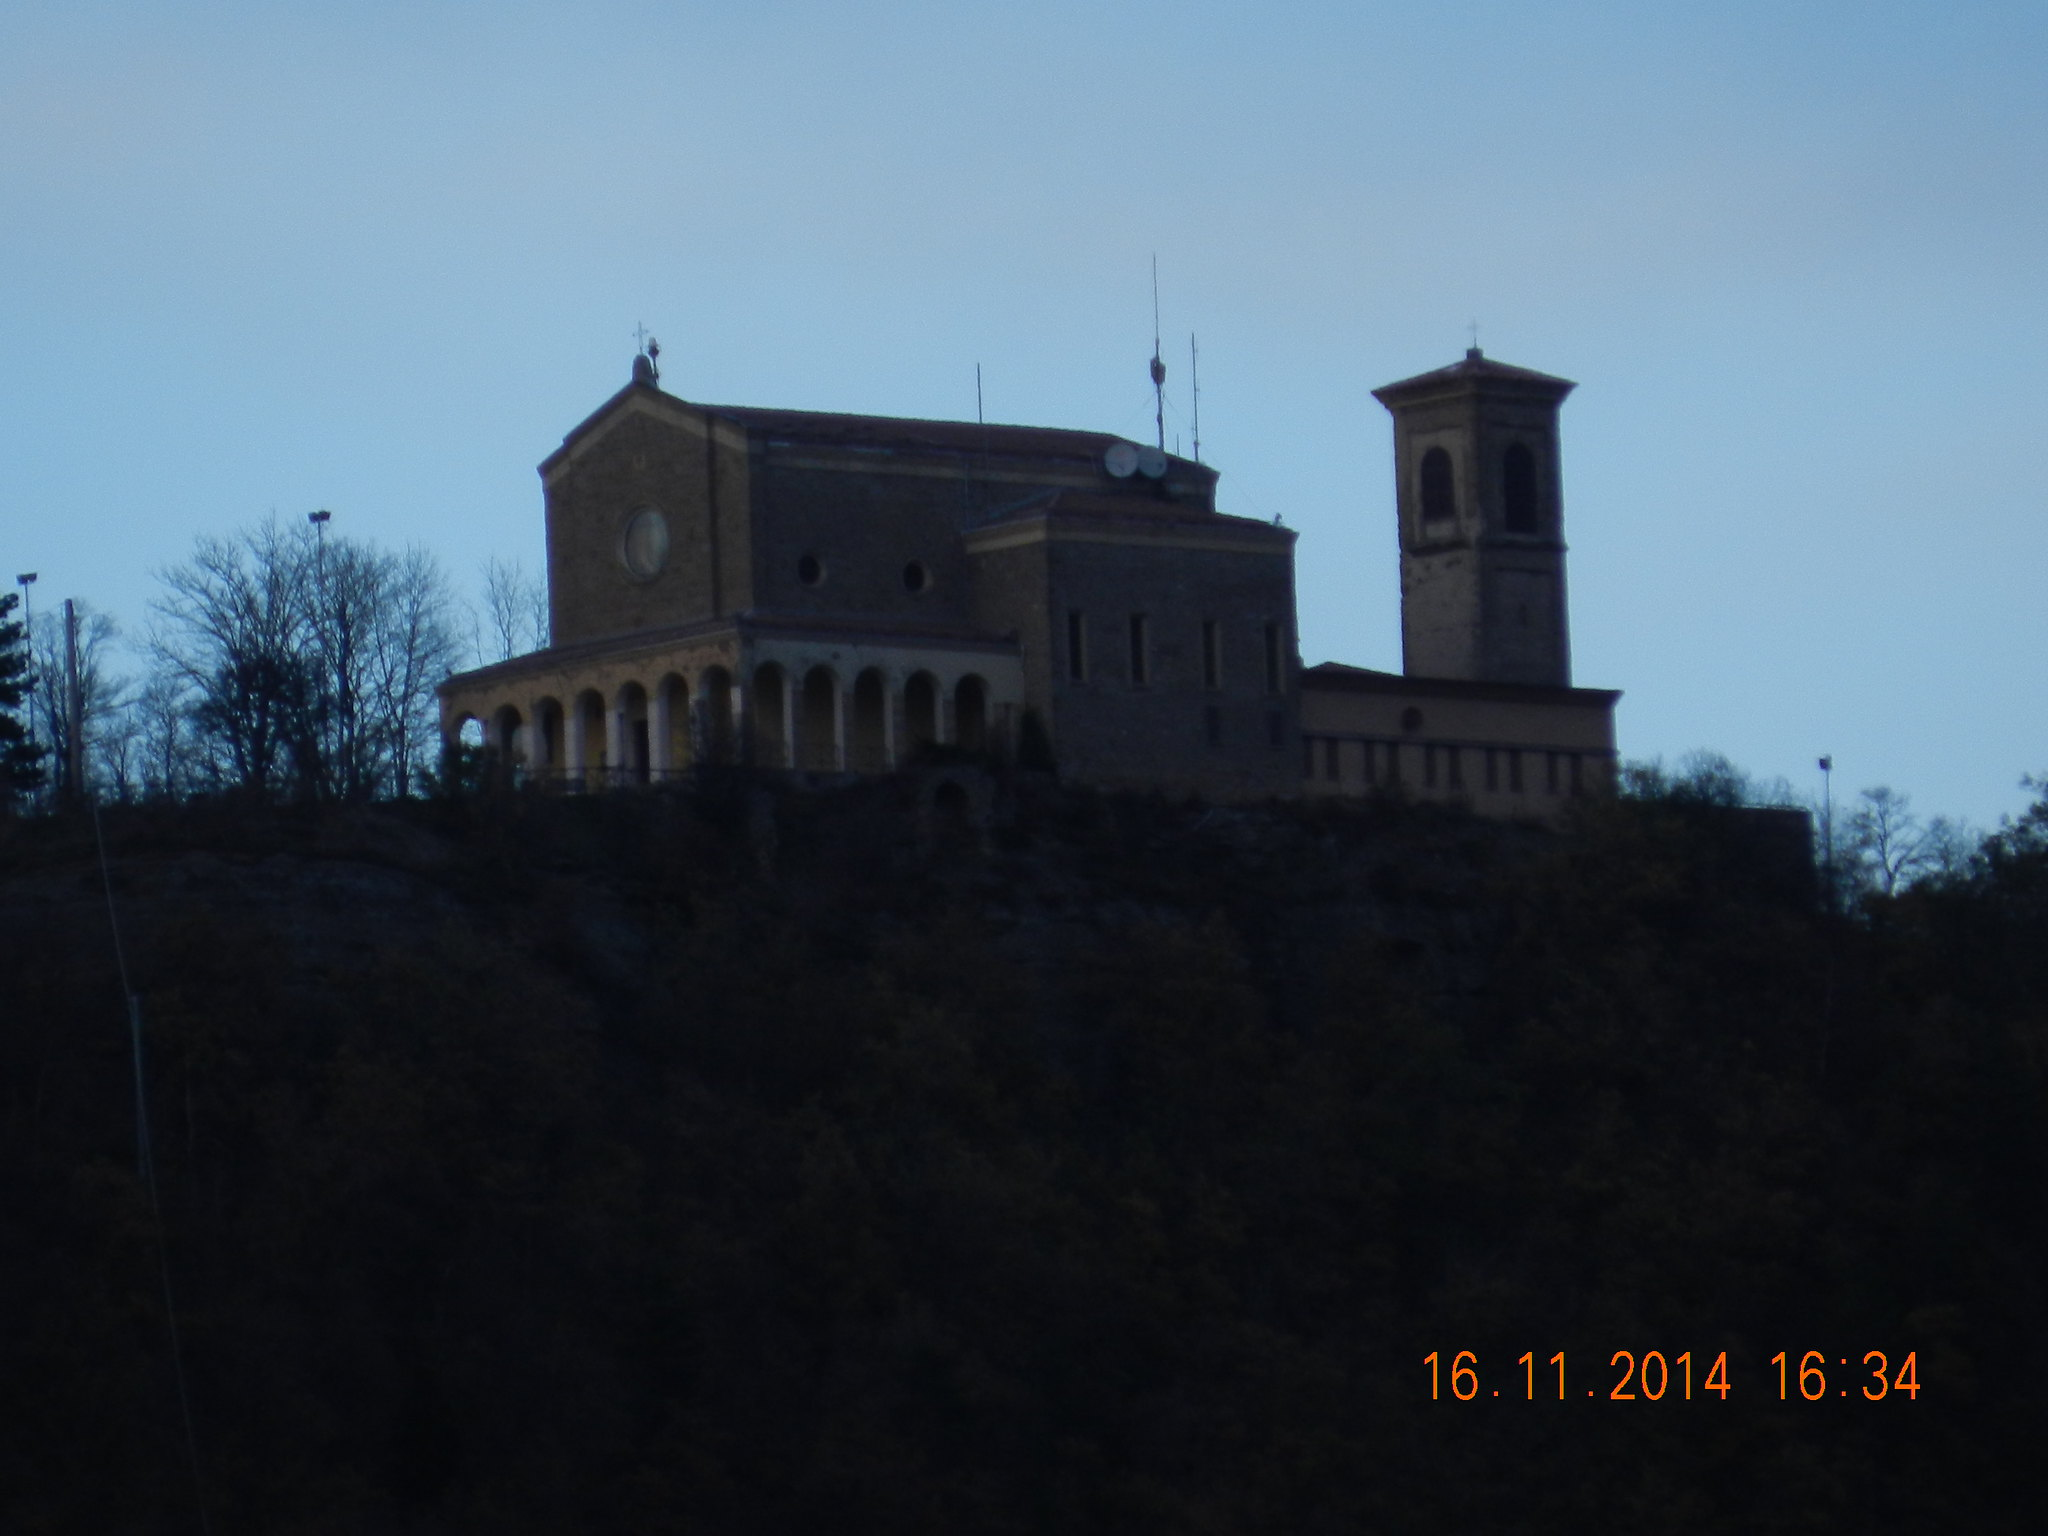 DSCN5326 - Santuario Monte delle Formiche